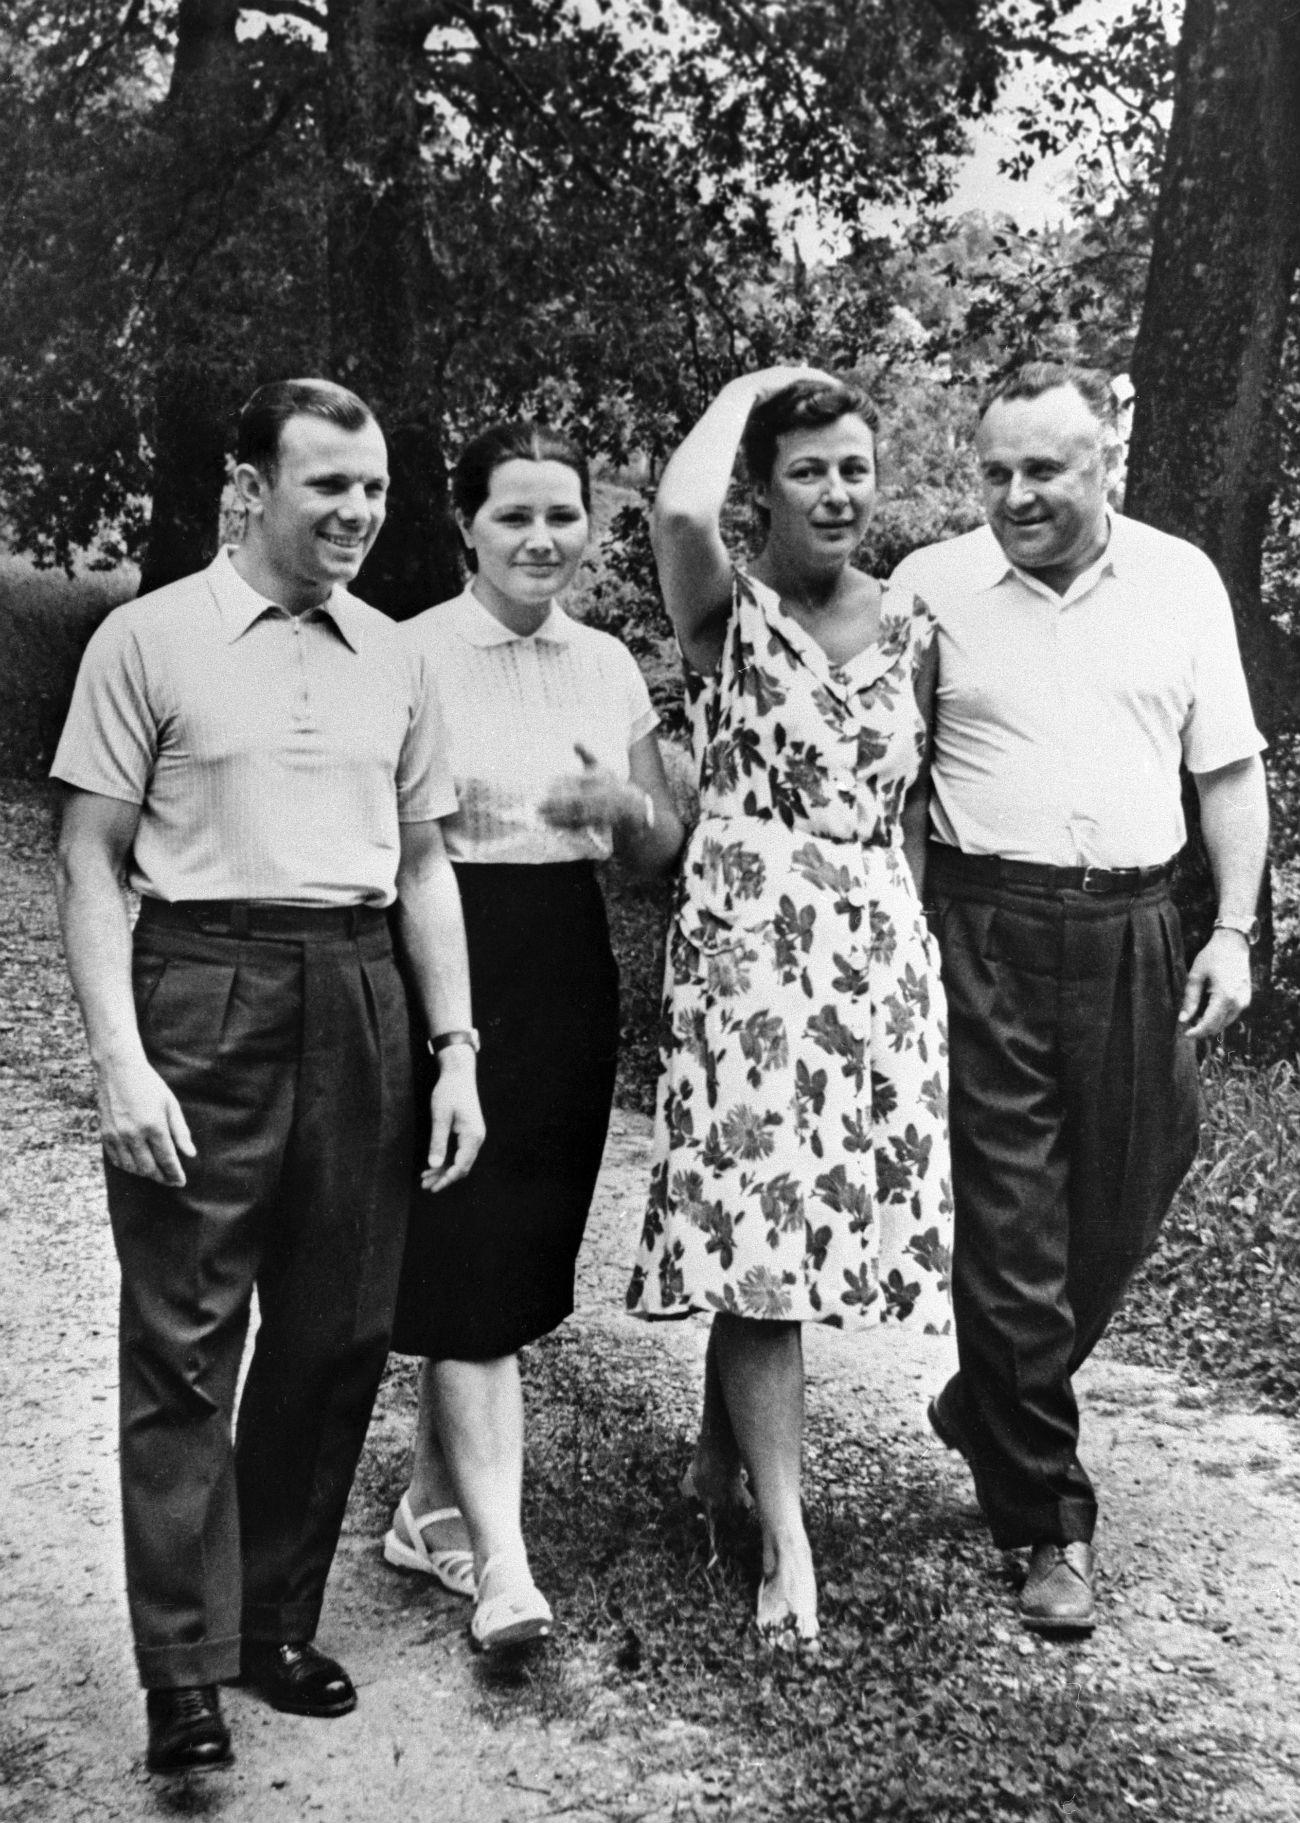 Sergueï Korolev, Iouri Gagarine et leurs épouses Nina Koroleva et Valentina Gagarina, mai 1961.